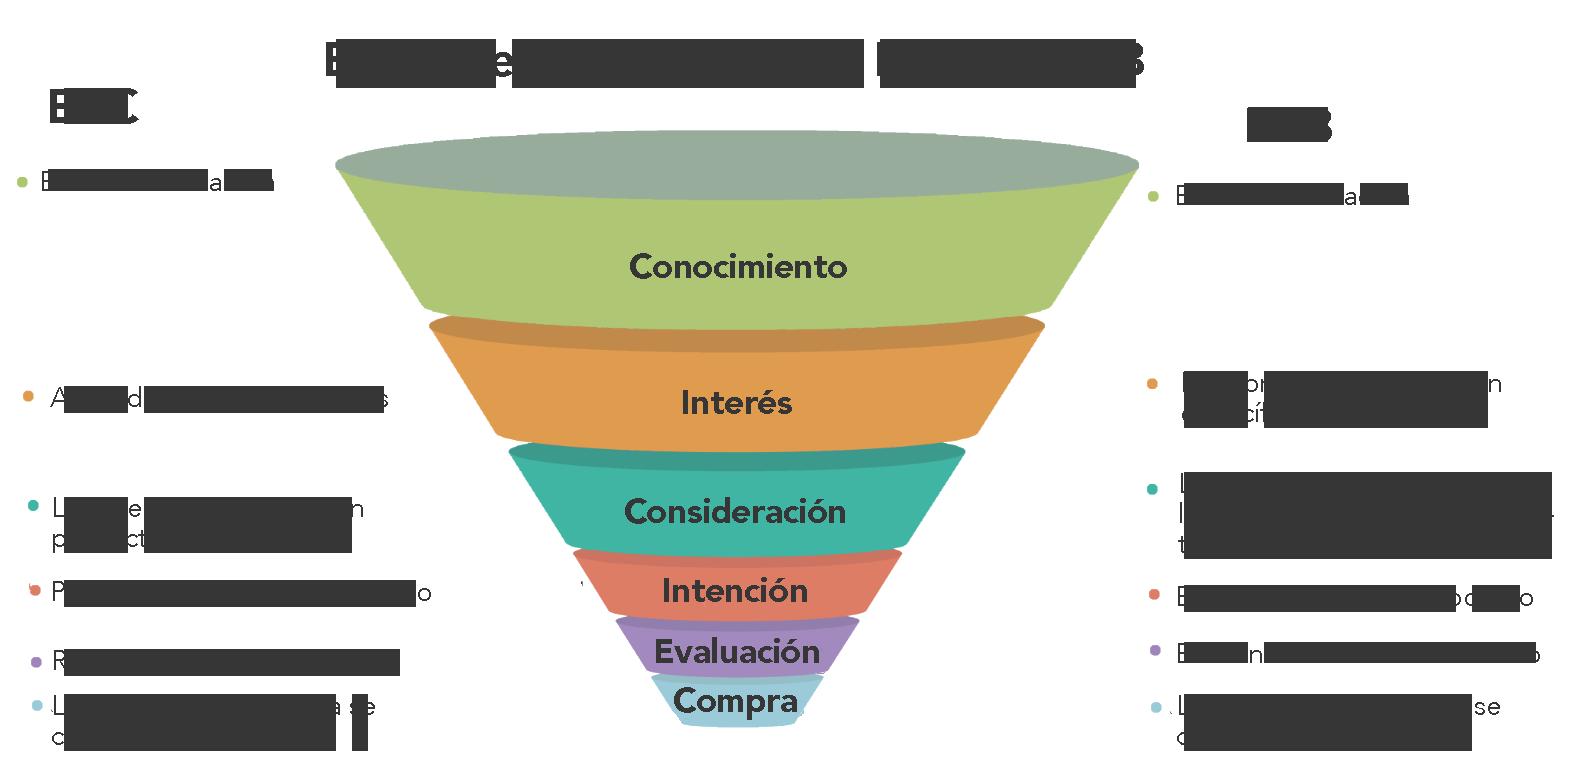 Funnel de Marketing y ventas B2B vs B2C.png